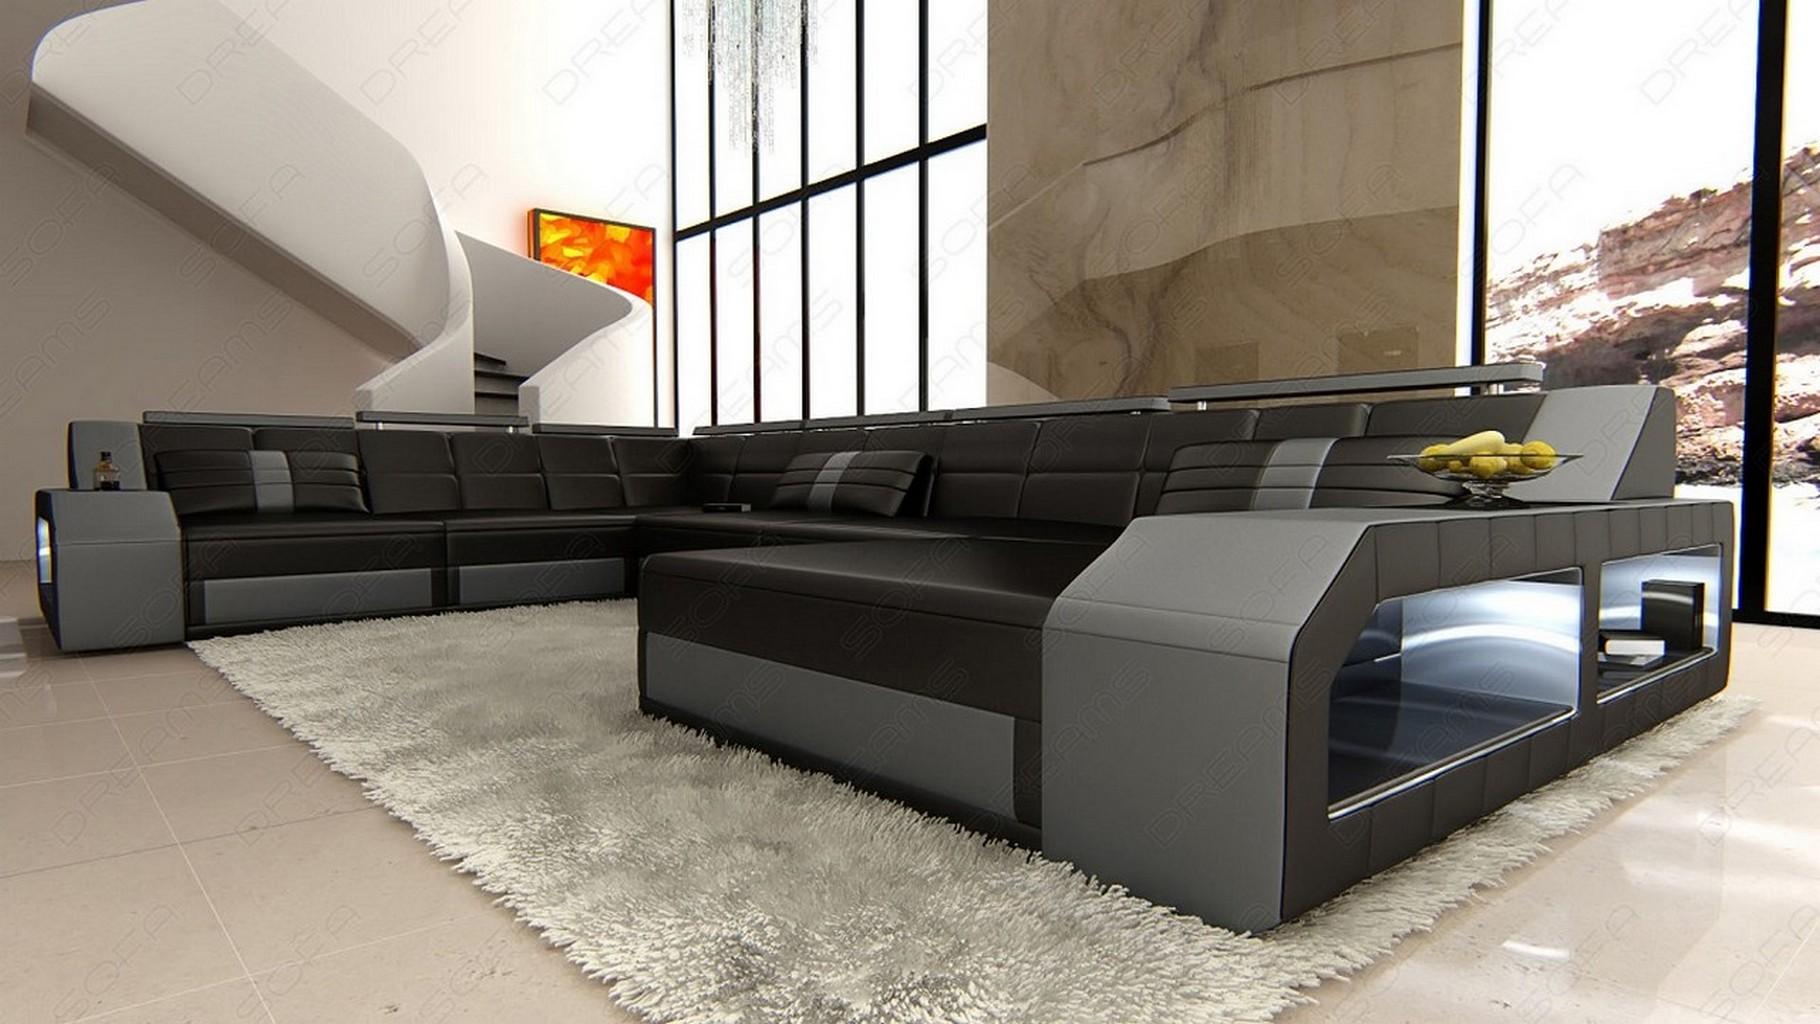 design sectional sofa matera xxl with led lights black. Black Bedroom Furniture Sets. Home Design Ideas